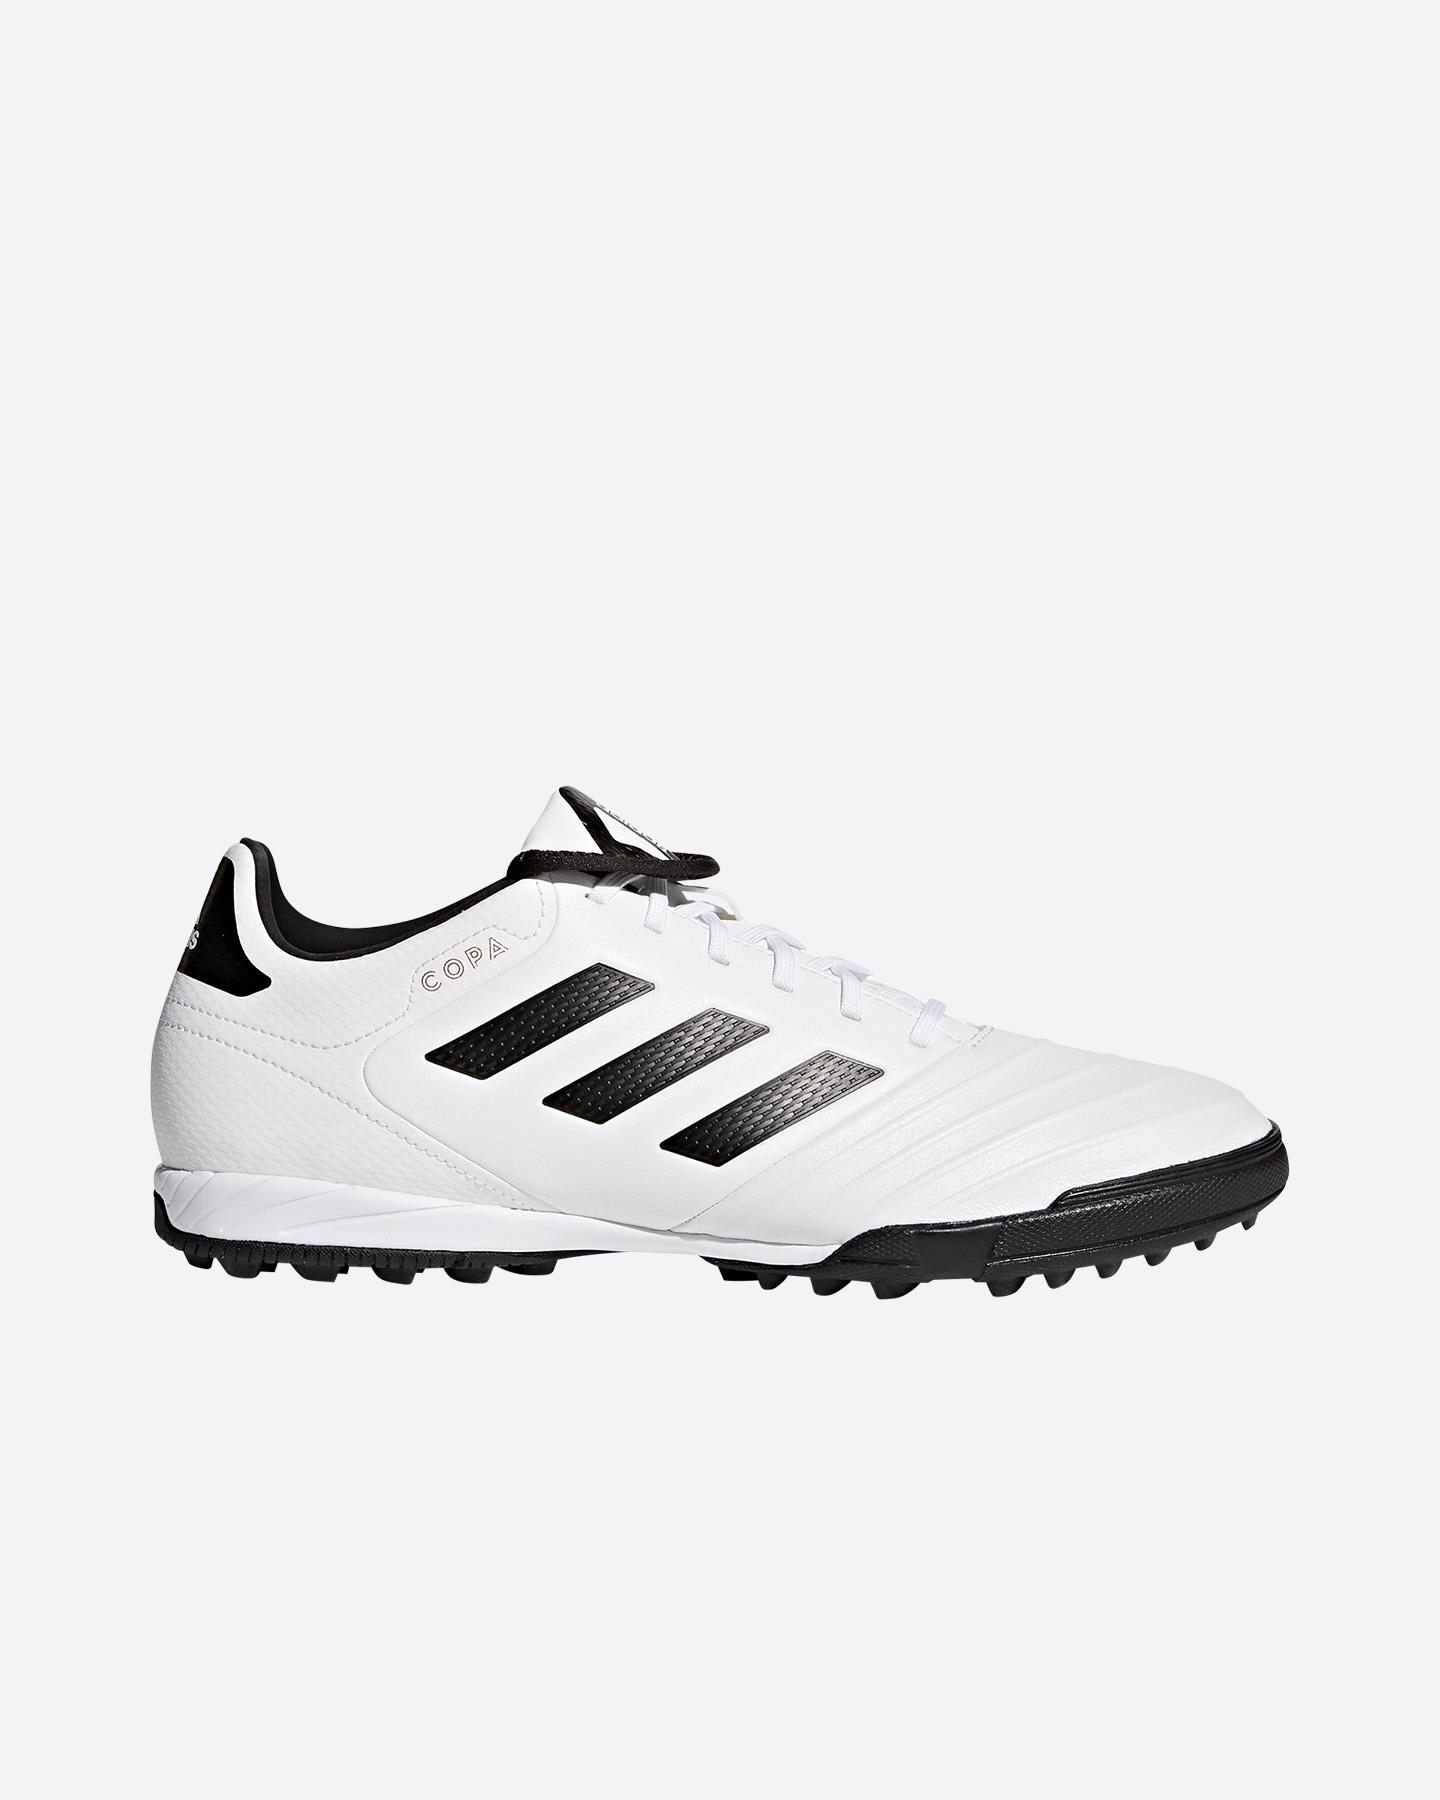 scarpe adidas copa tango 18.3